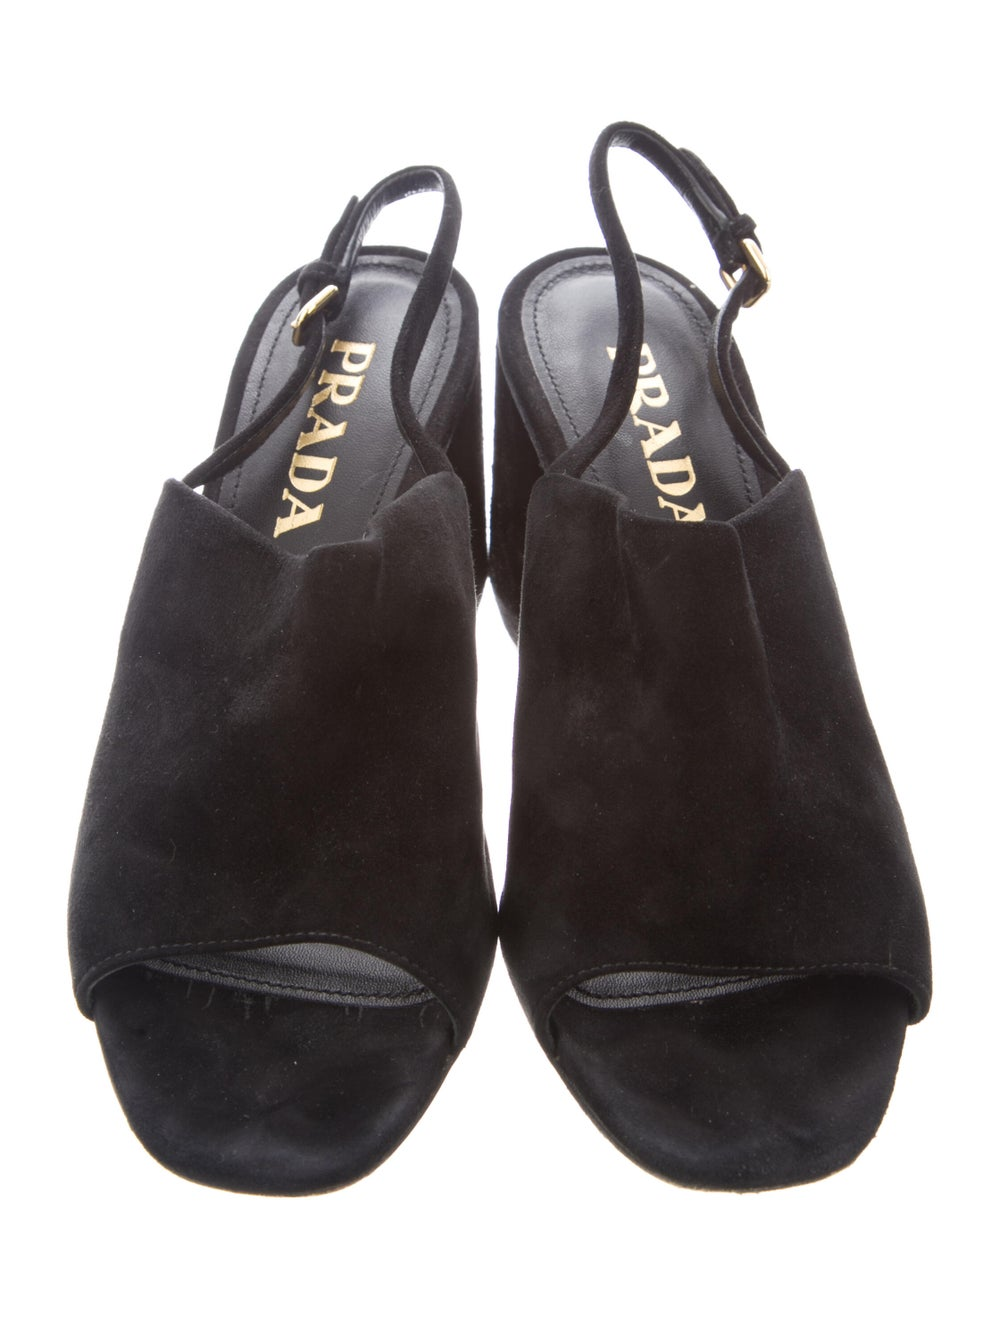 Prada Suede Slingback Sandals Black - image 3